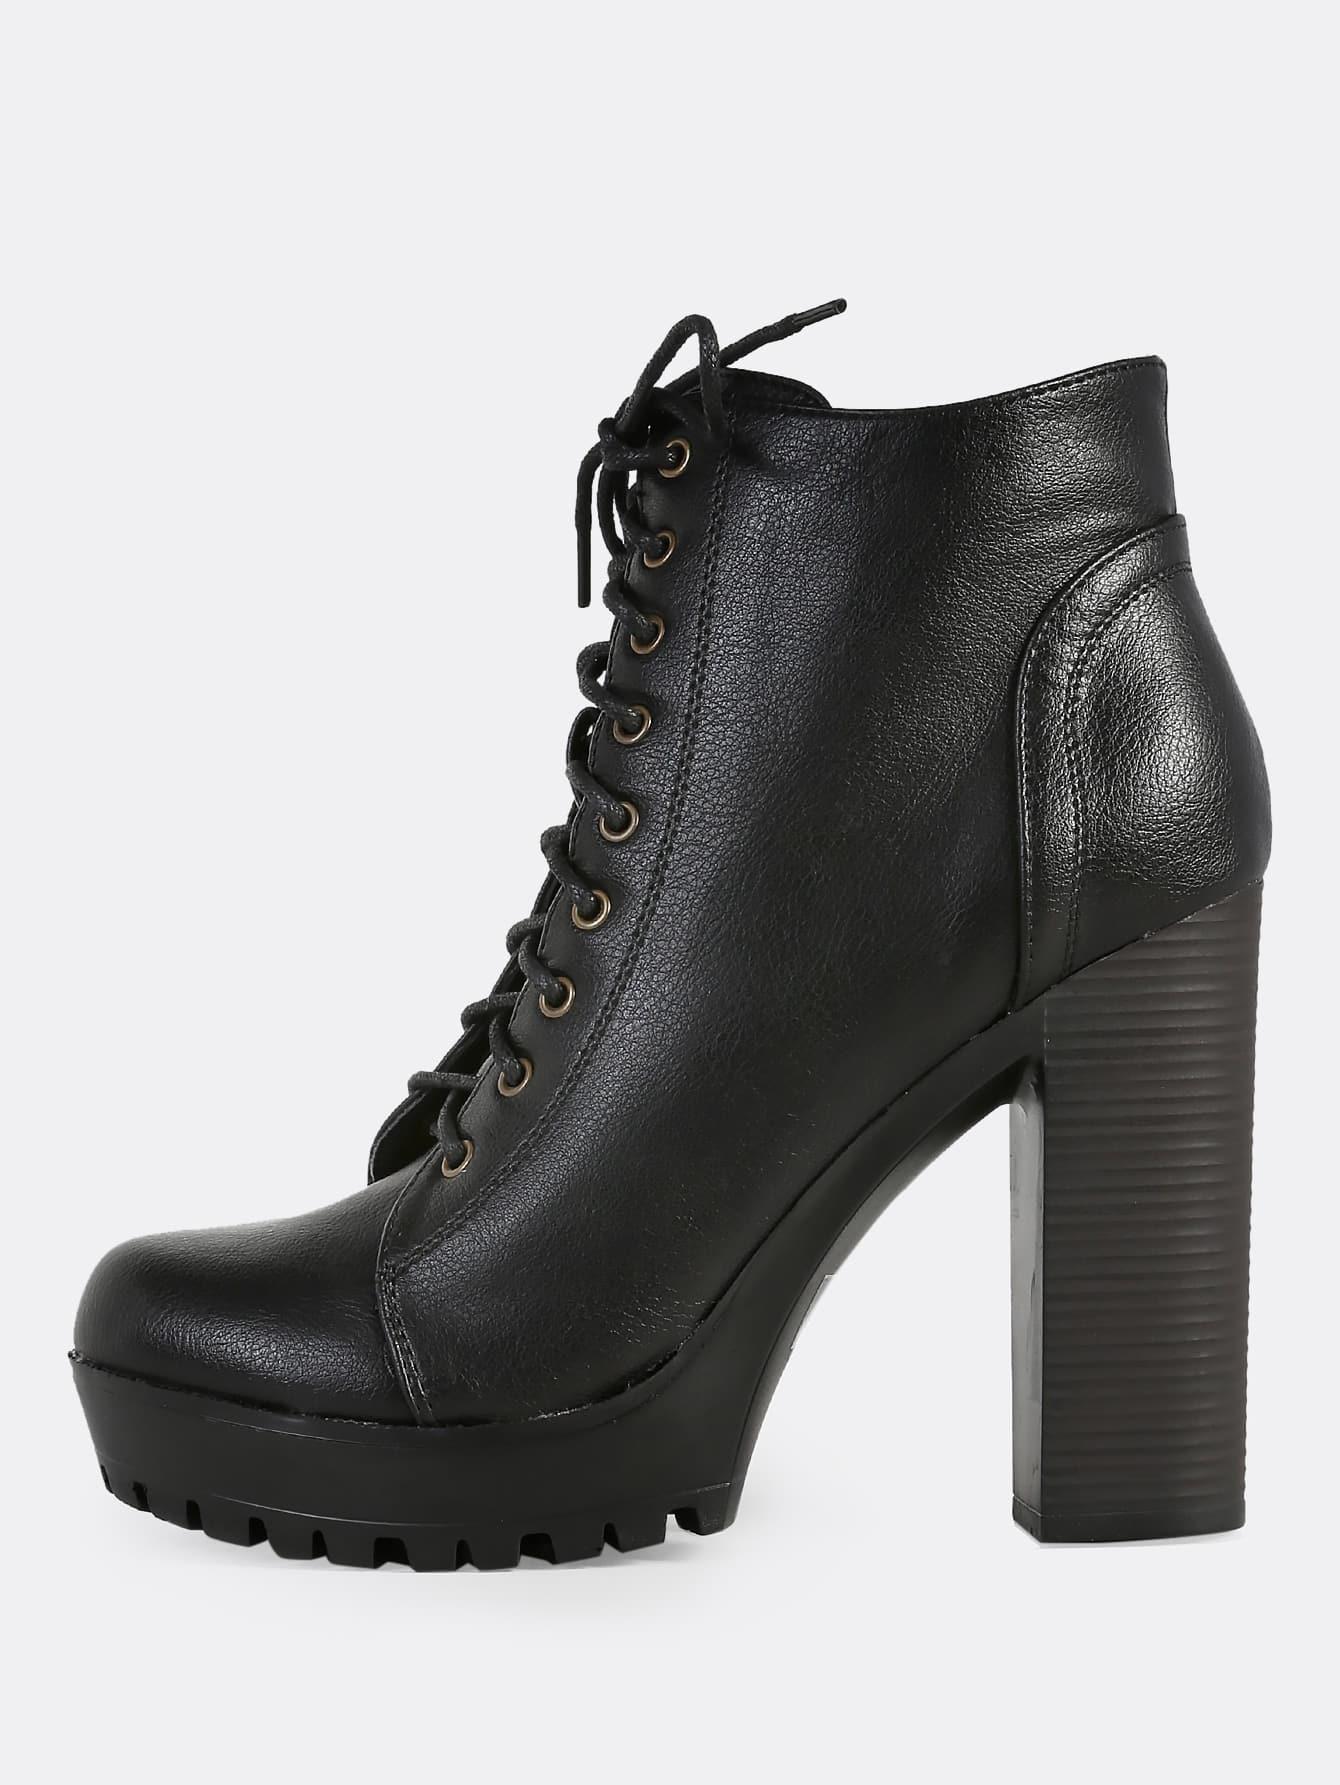 Front Lace Up Zip Up Heel Booties BLACK -SheIn(Sheinside)